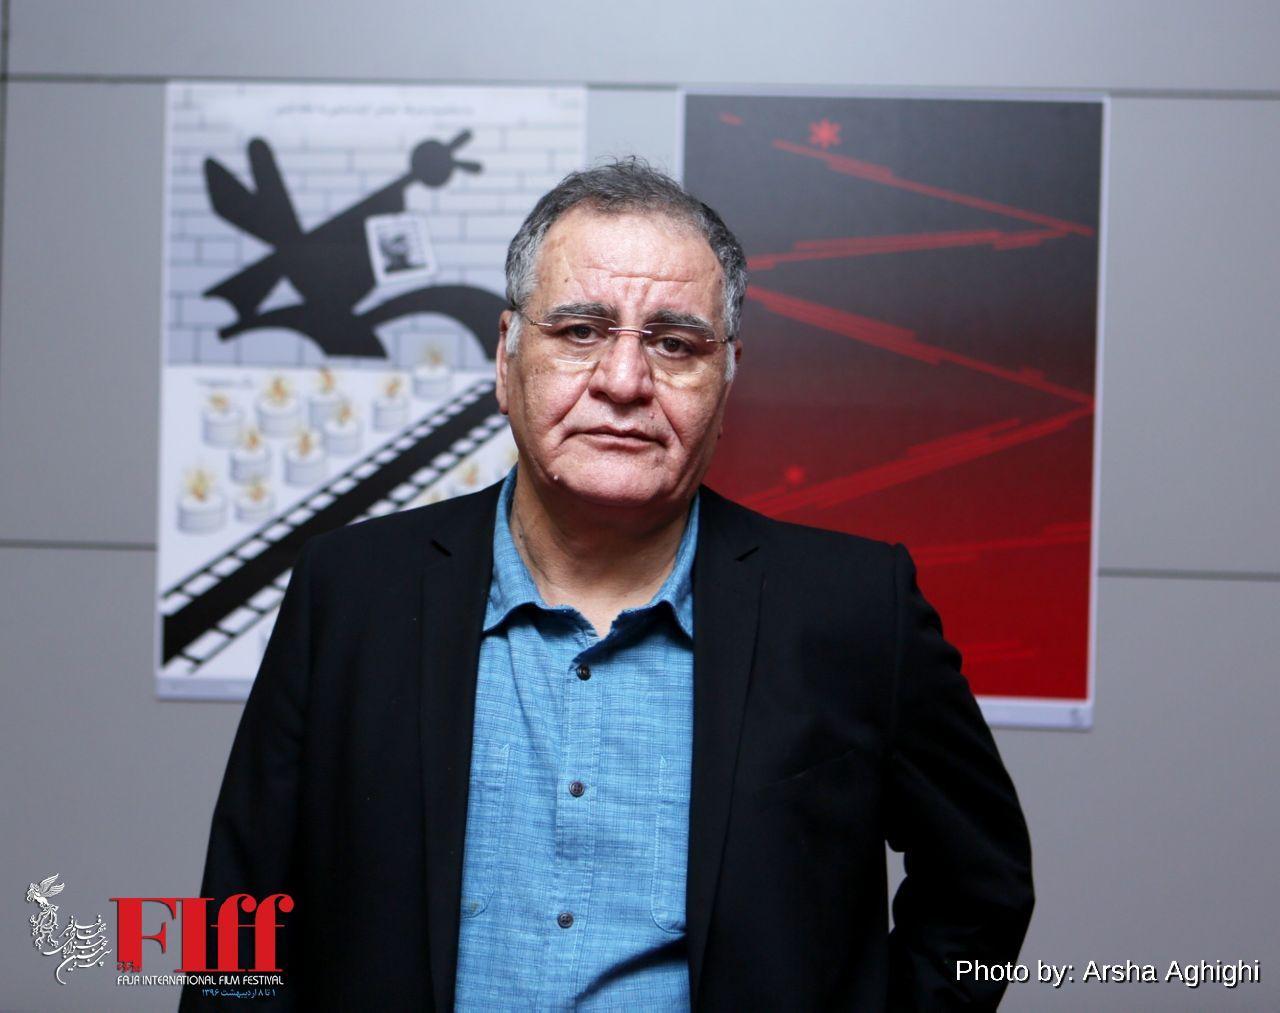 Sadrameli Highlights the Global Visibility of Iranian Cinema